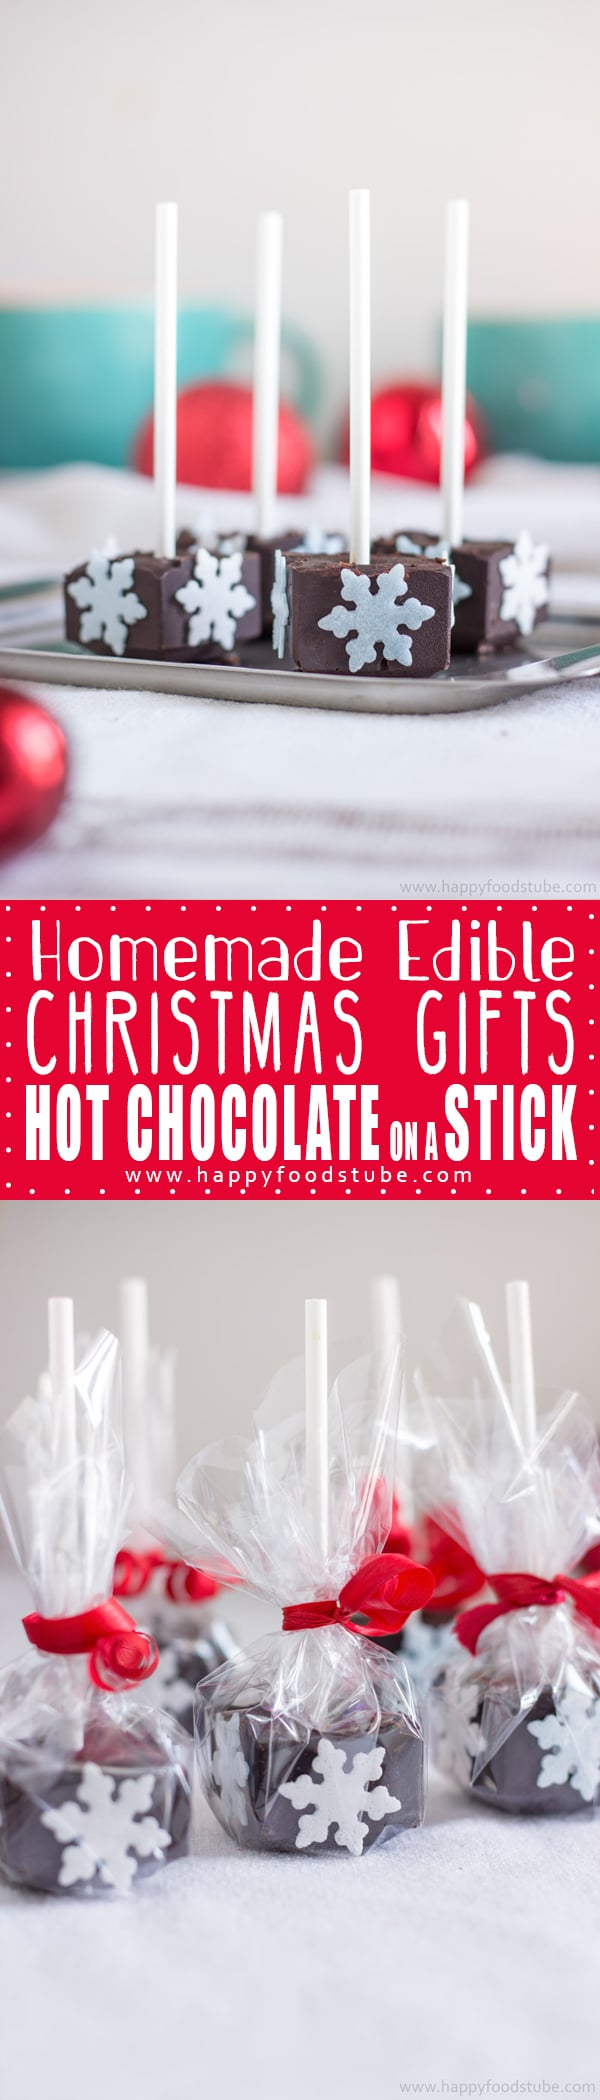 Homemade Hot Chocolate Sticks - Happy Foods Tube